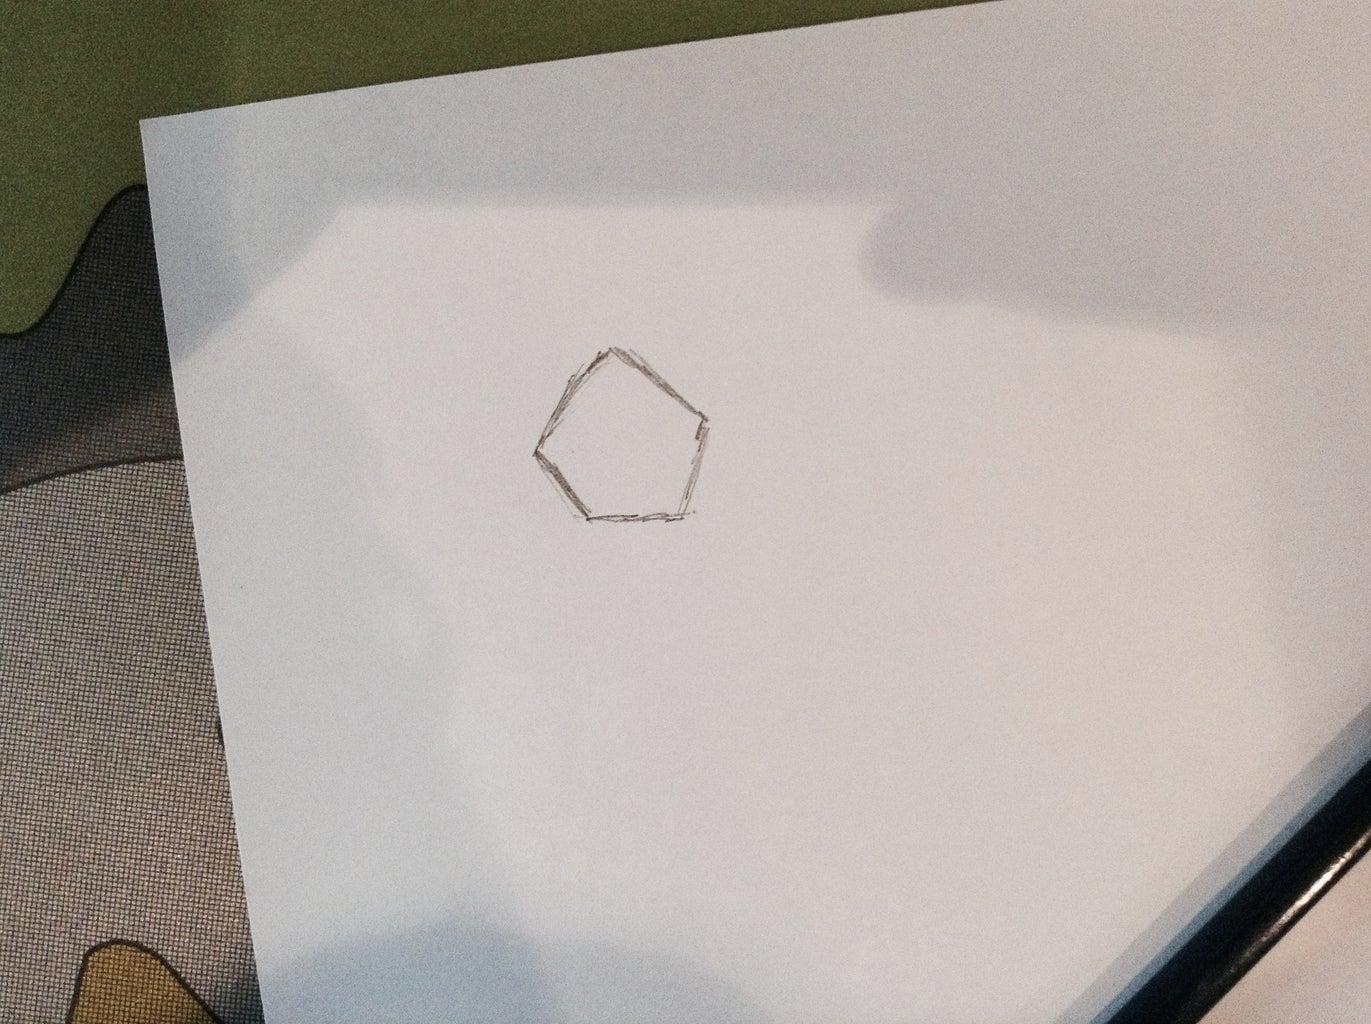 Draw a Pentagon